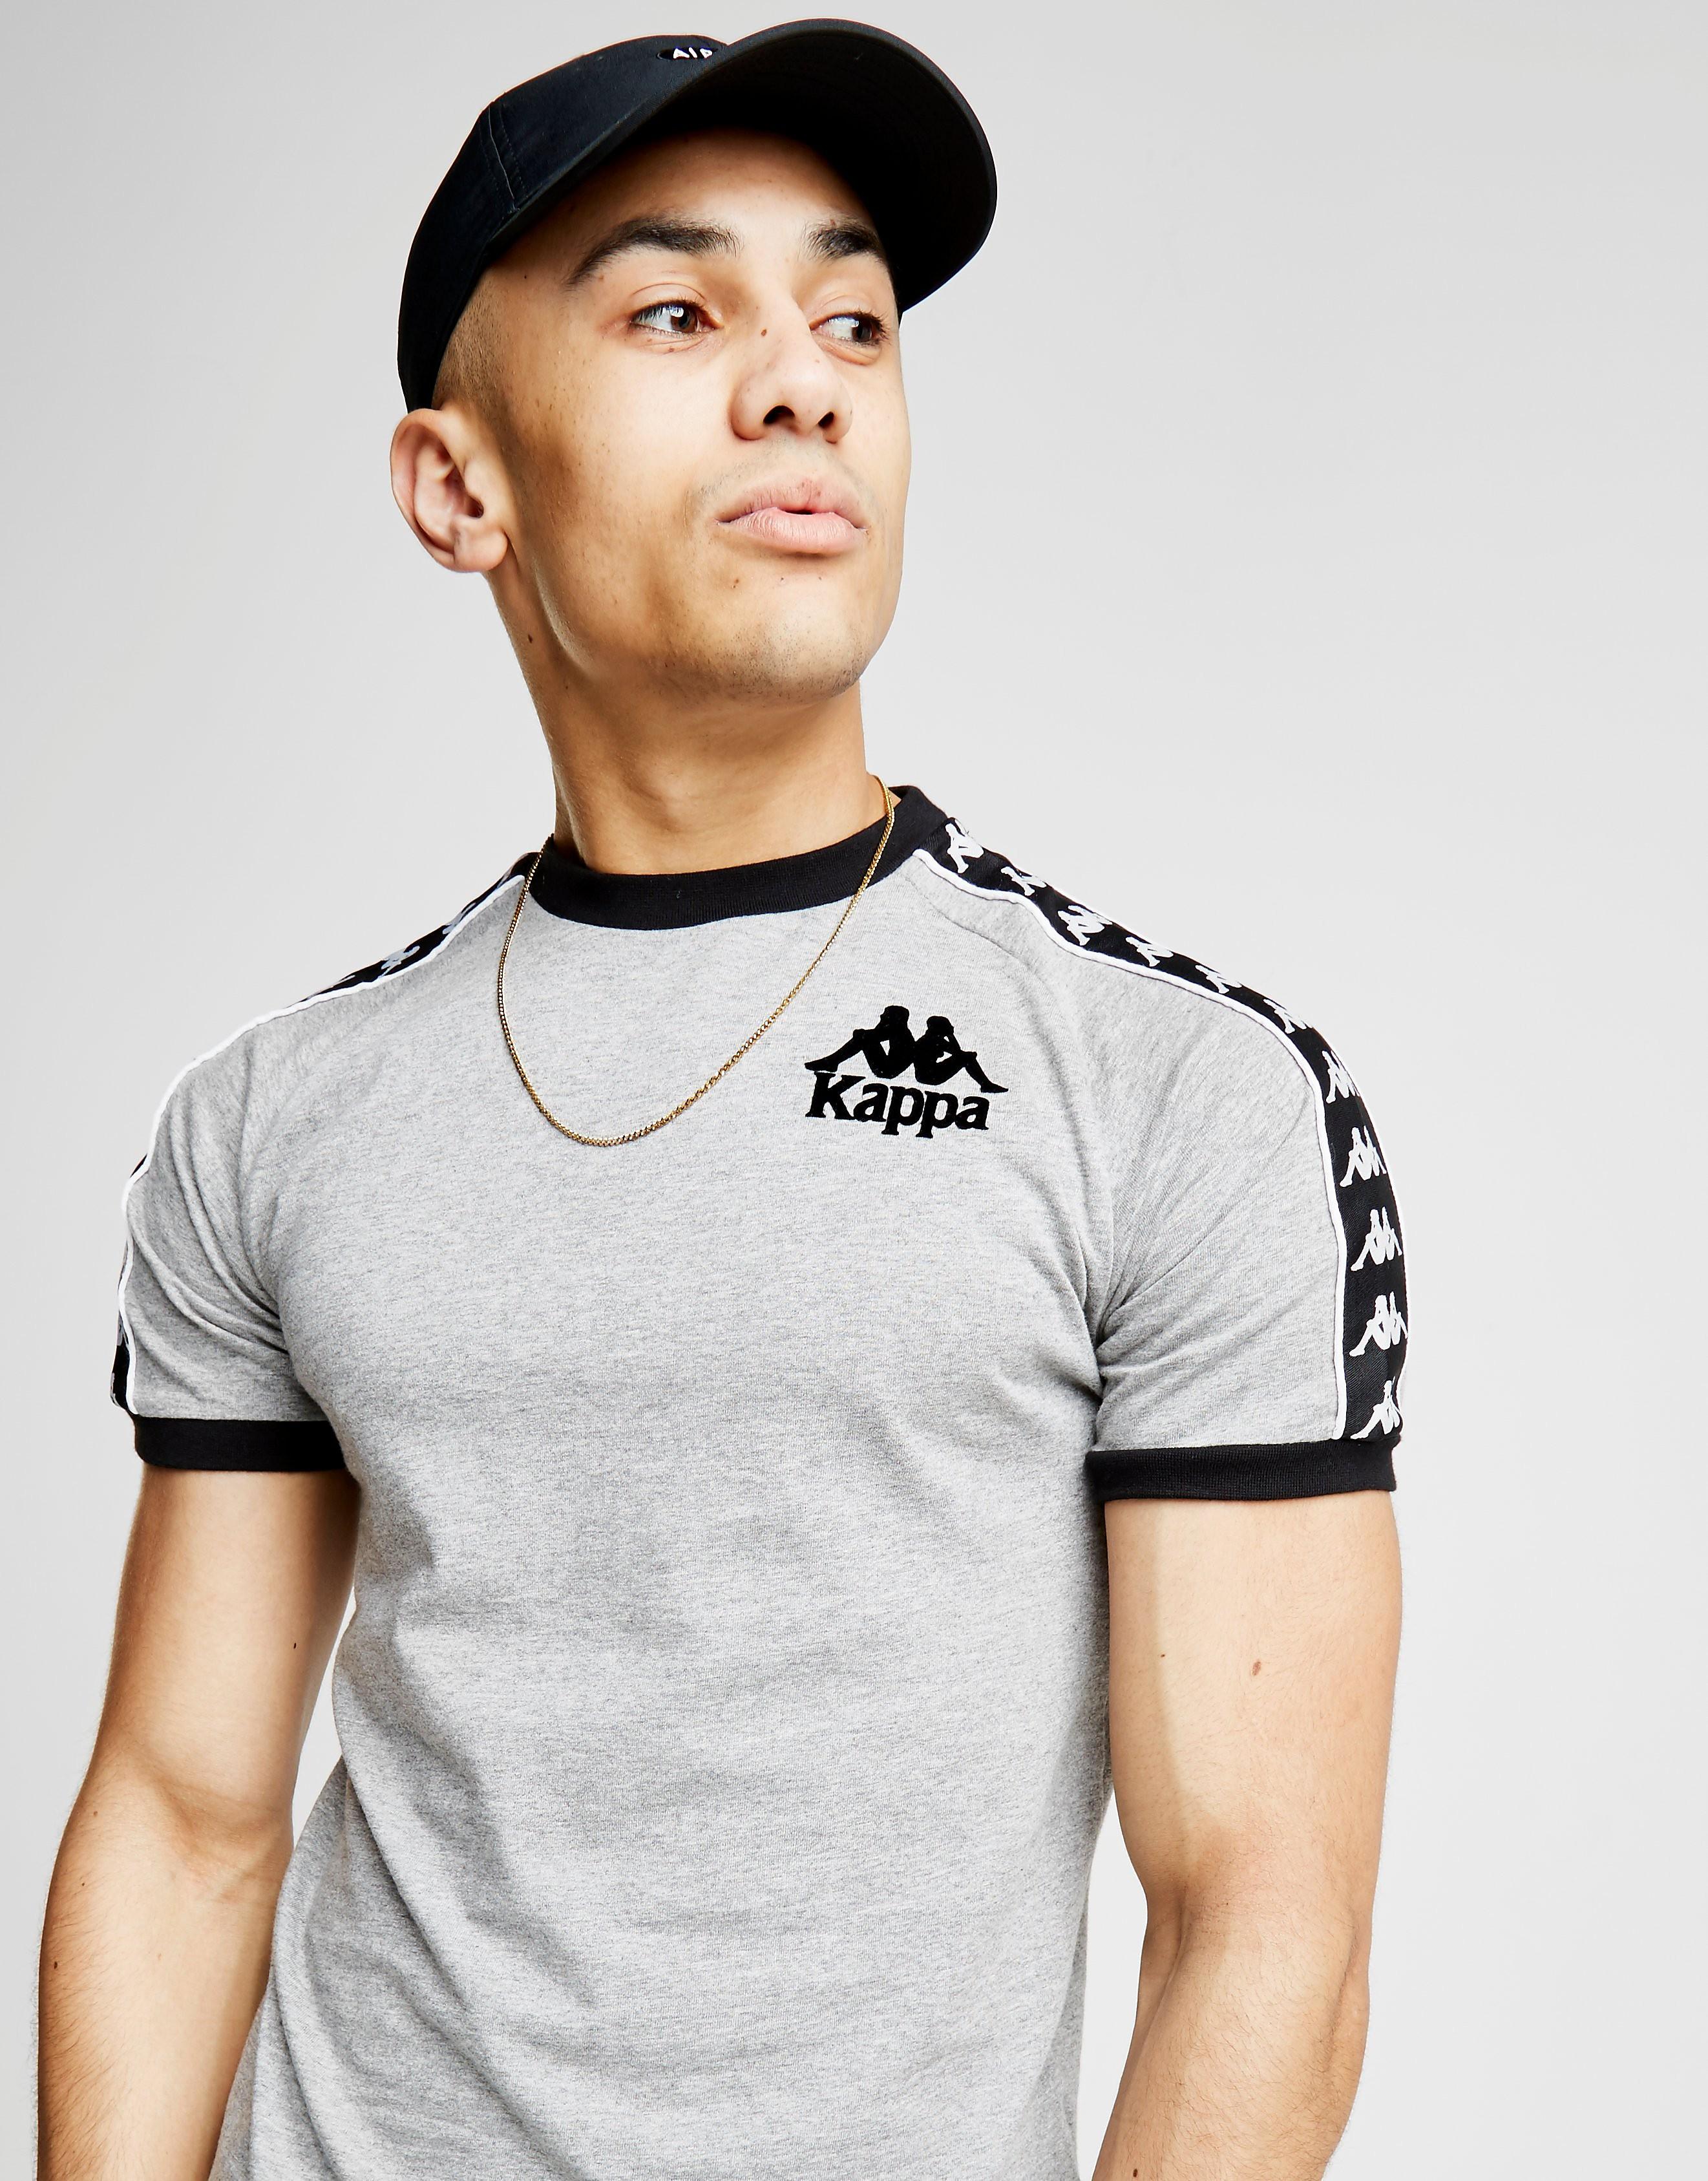 Kappa Authentic Raul T-Shirt